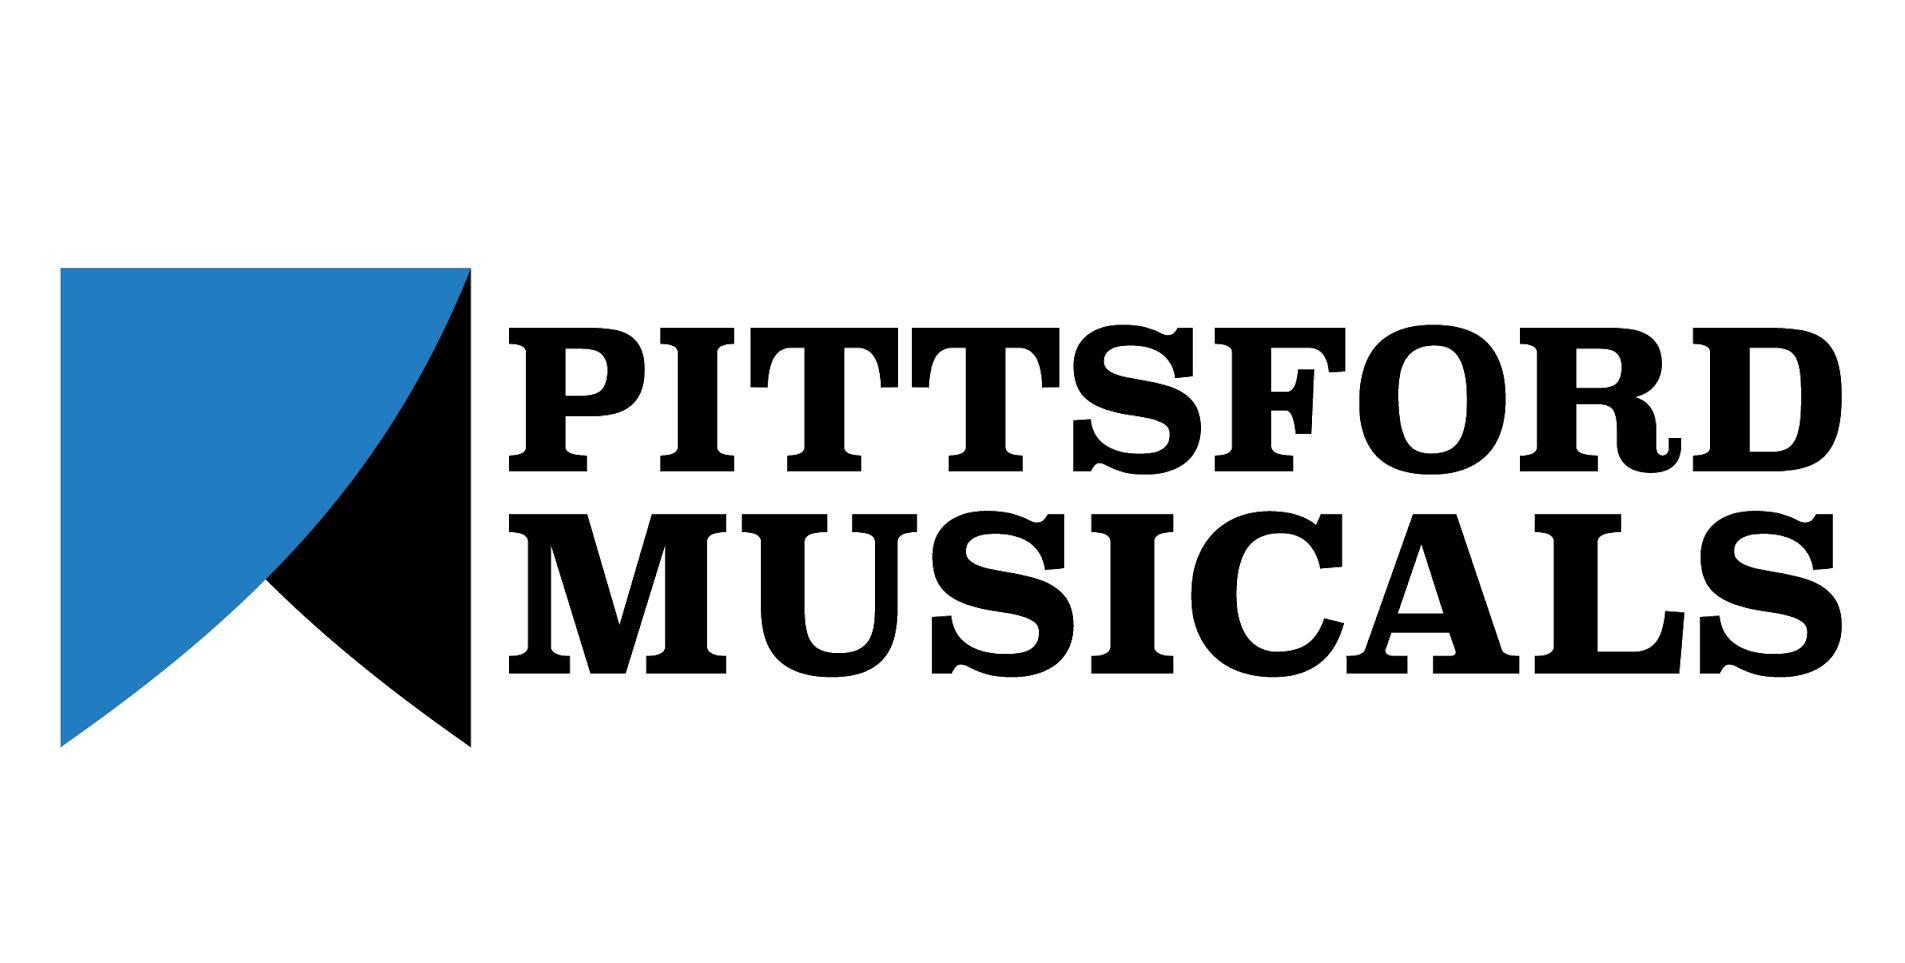 Pittsford Musicals Logo